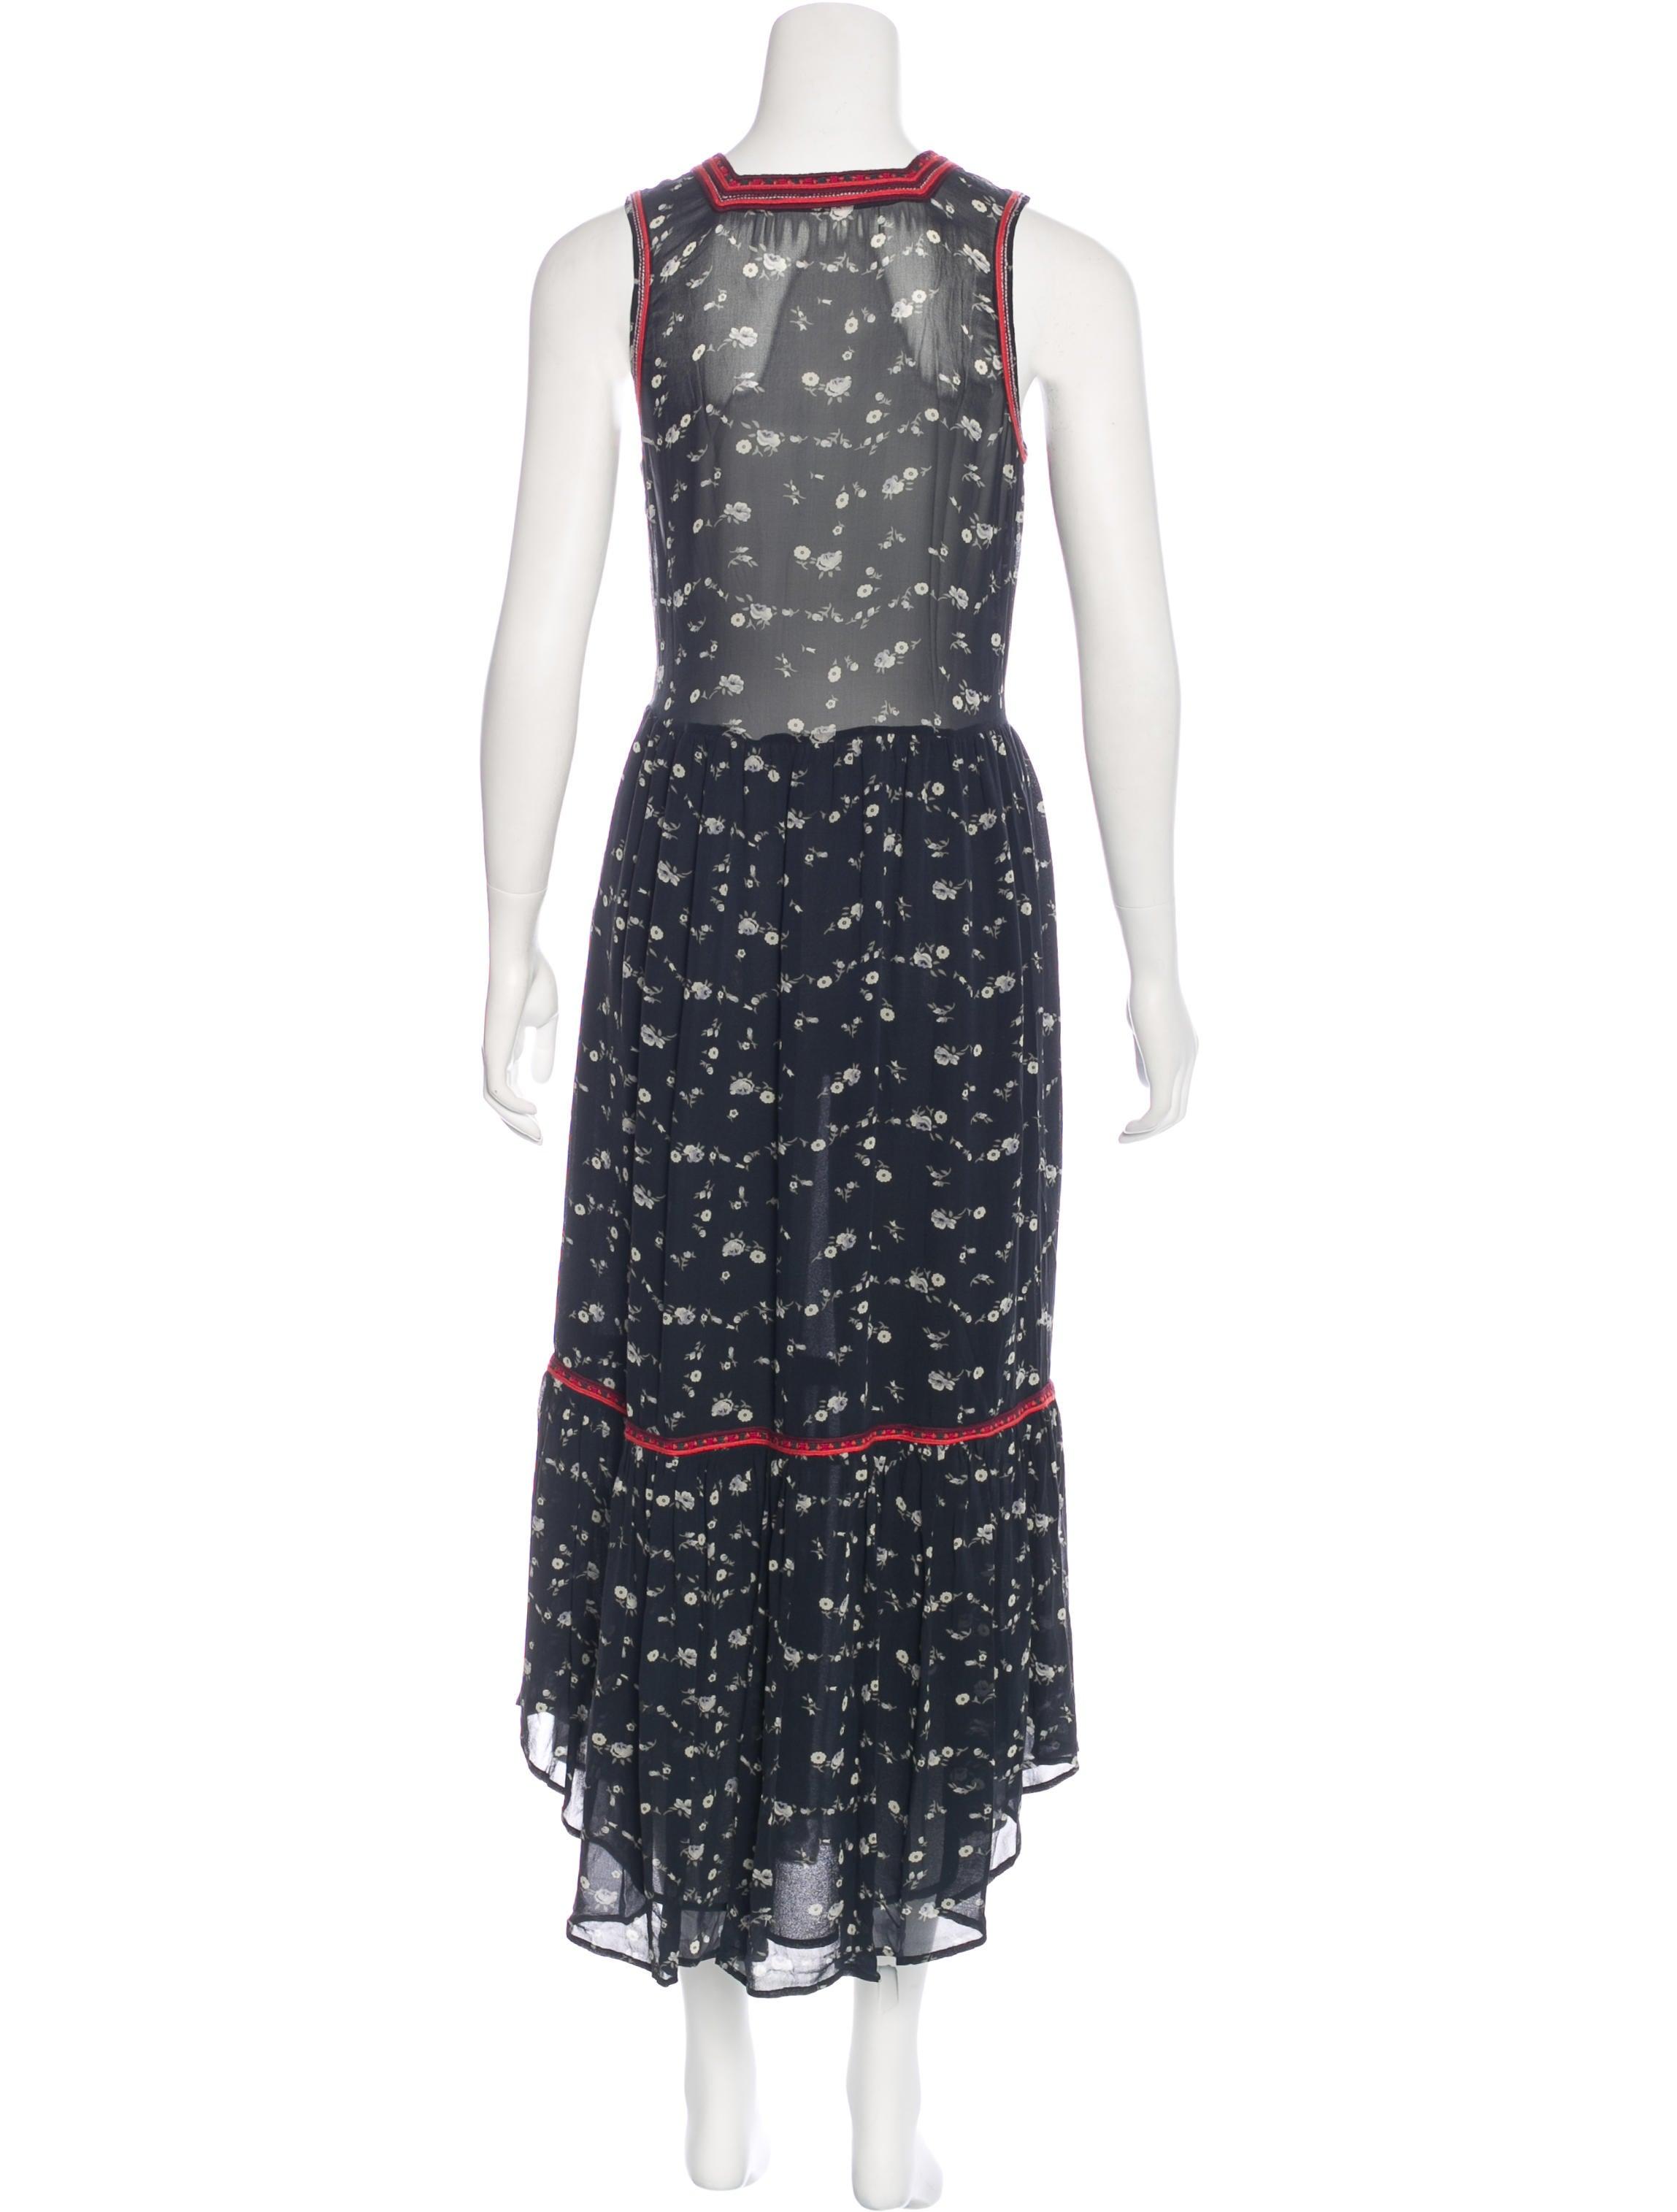 Ulla johnson silk embroidered dress clothing wul